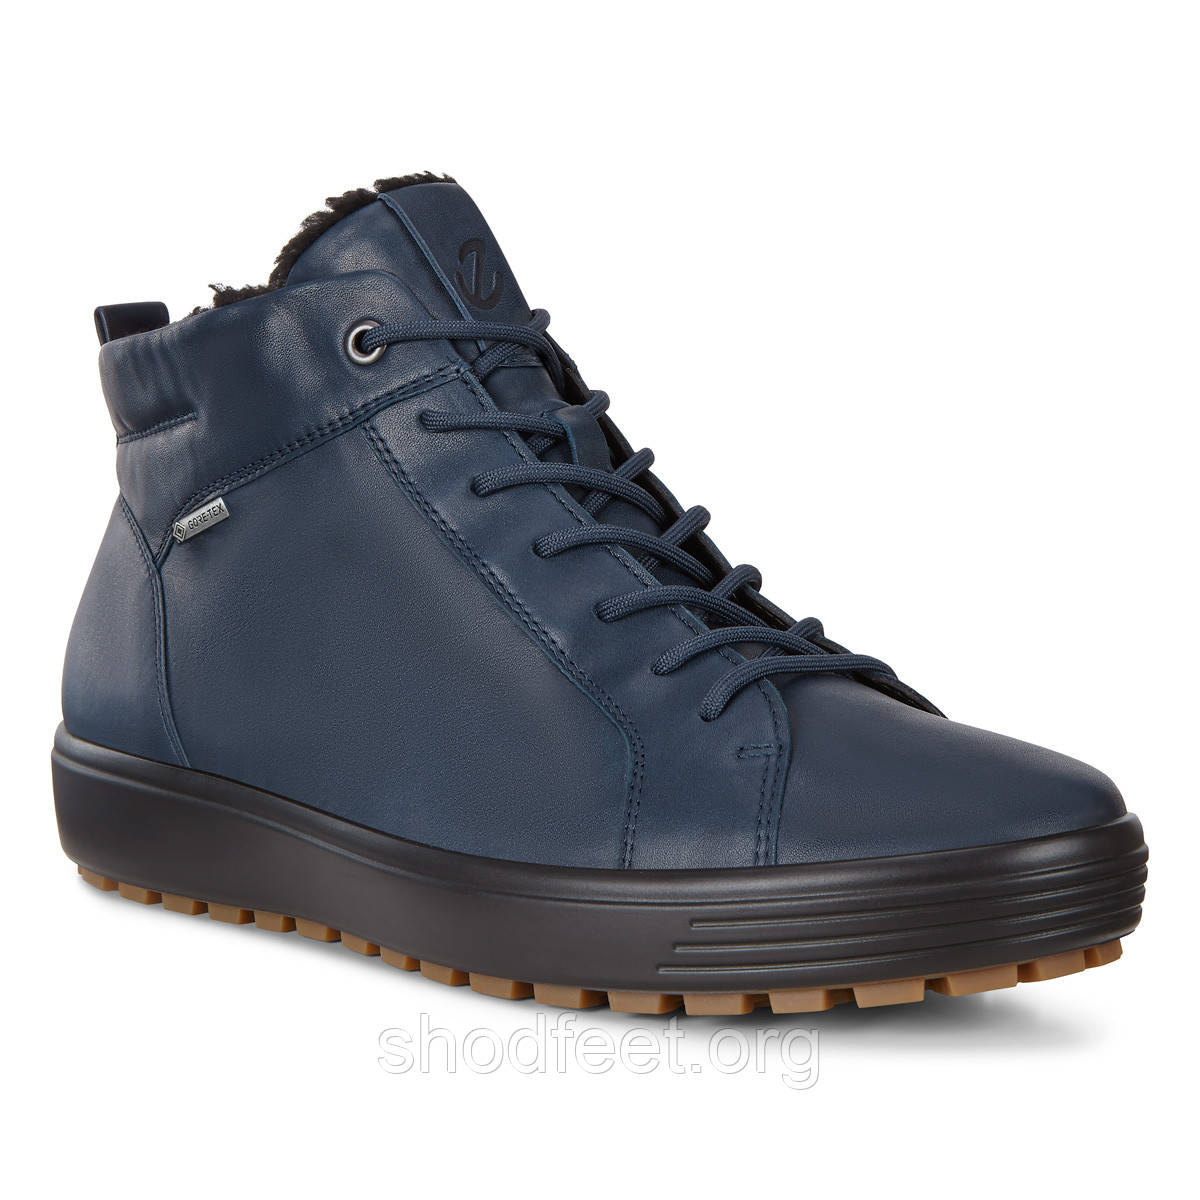 Мужские ботинки Ecco Soft 7 Tred Gore-Tex 450304-01303